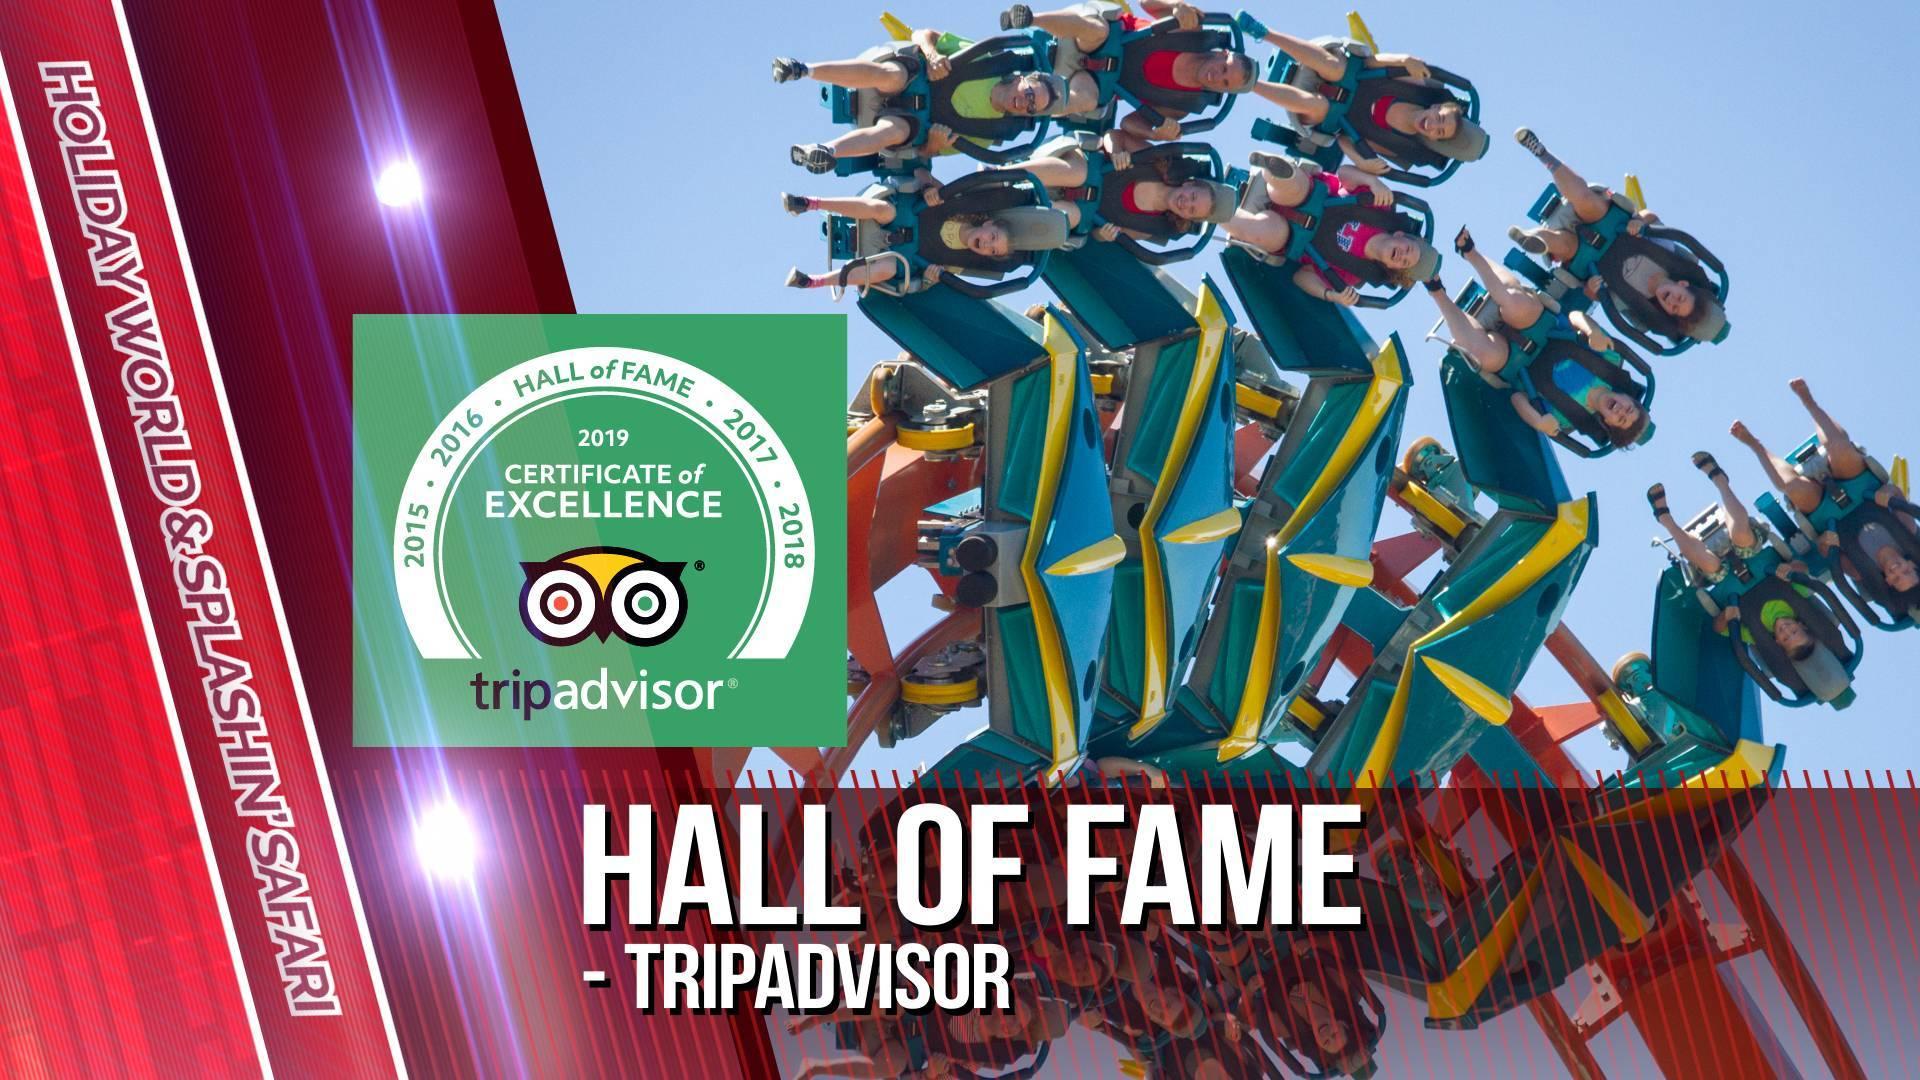 Holiday World & Splashin' Safari is in the TripAdvisor Hall of Fame!